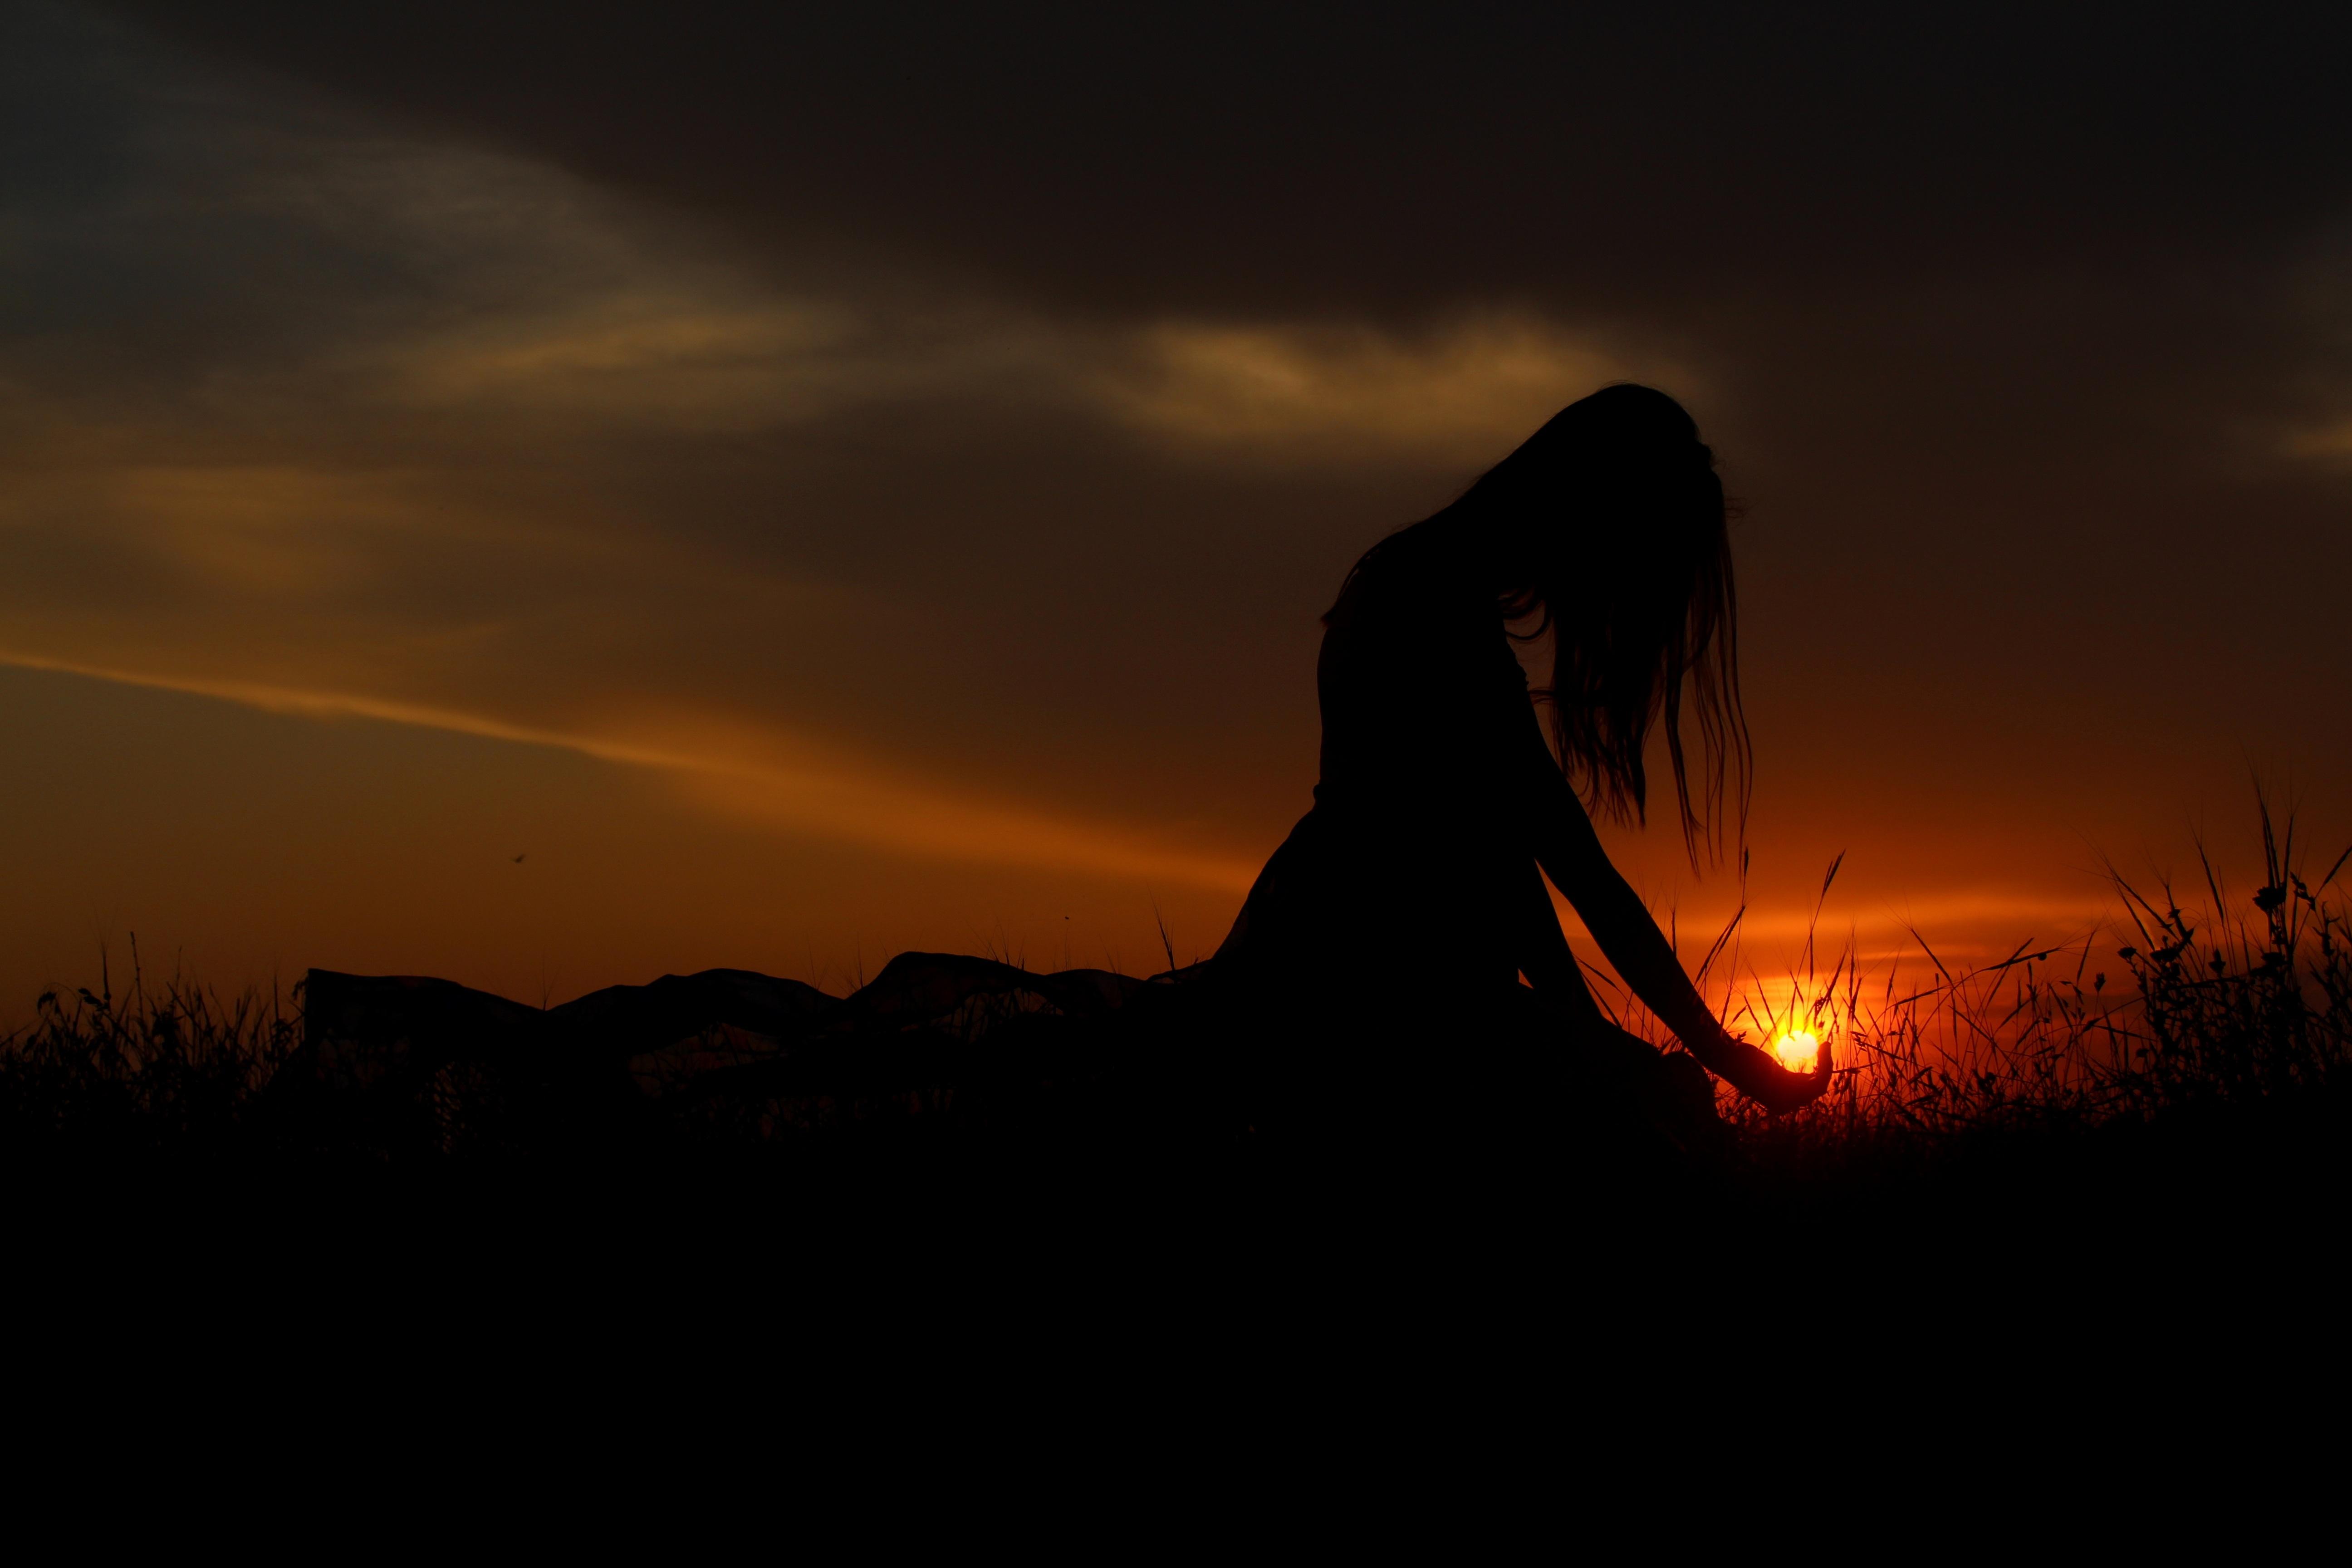 General 5184x3456 women silhouette dark shadow Sun sunset arms